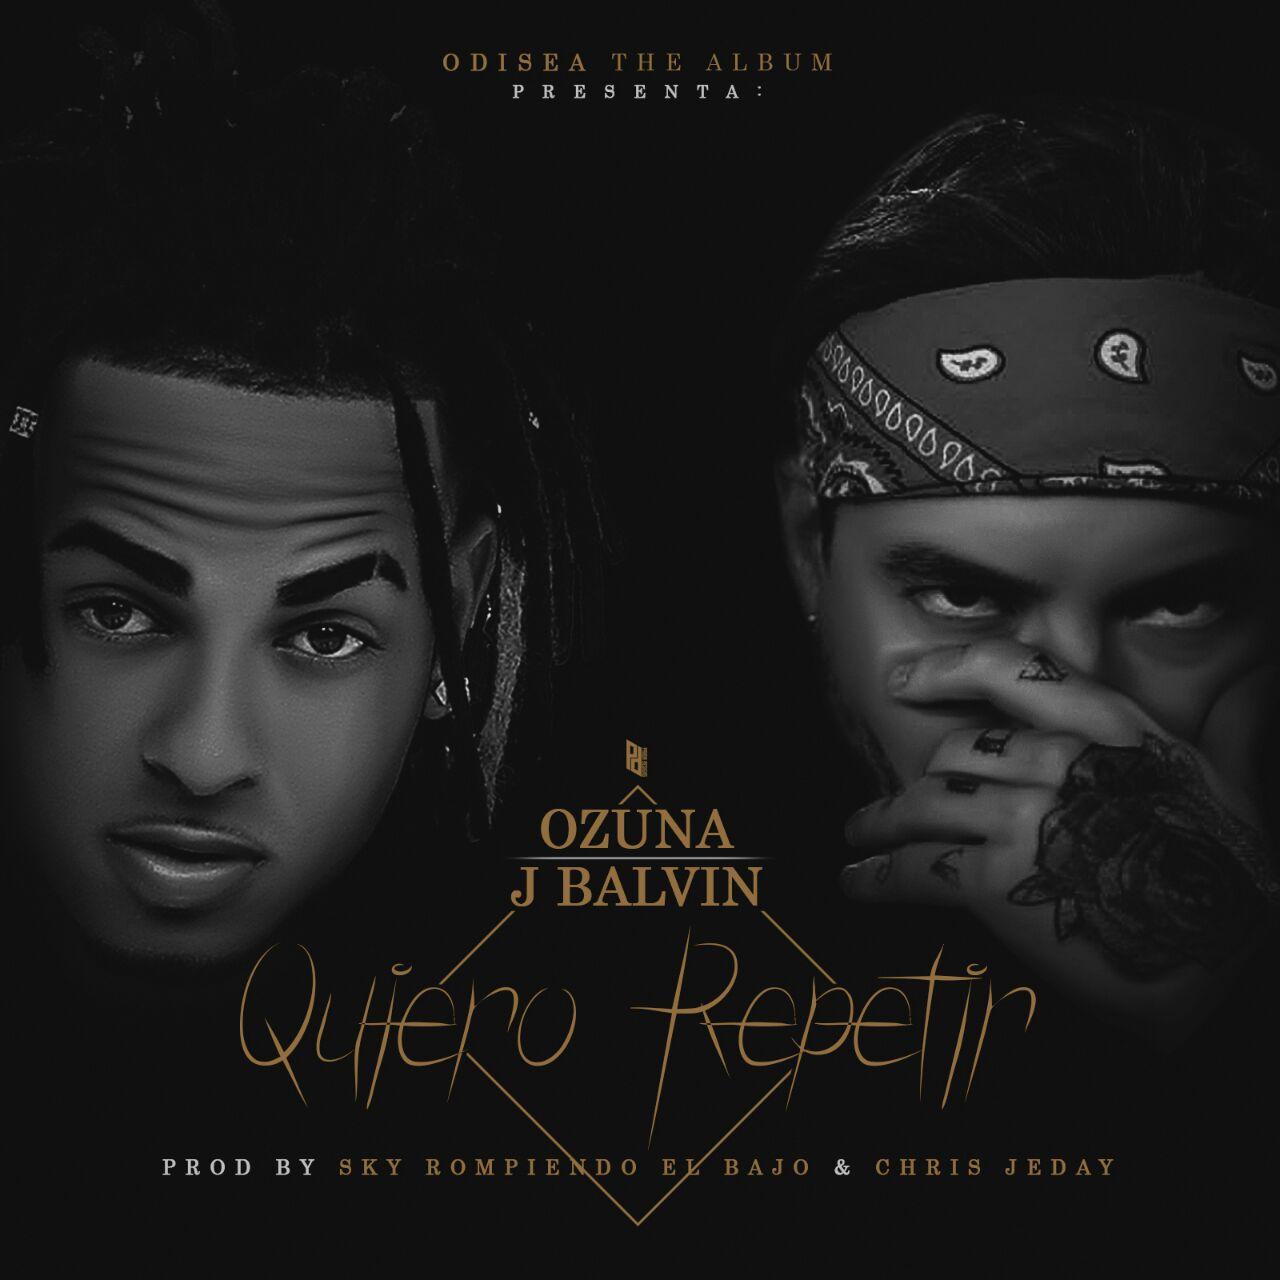 Ozuna Ft. J Balvin - Quiero Repetir MP3